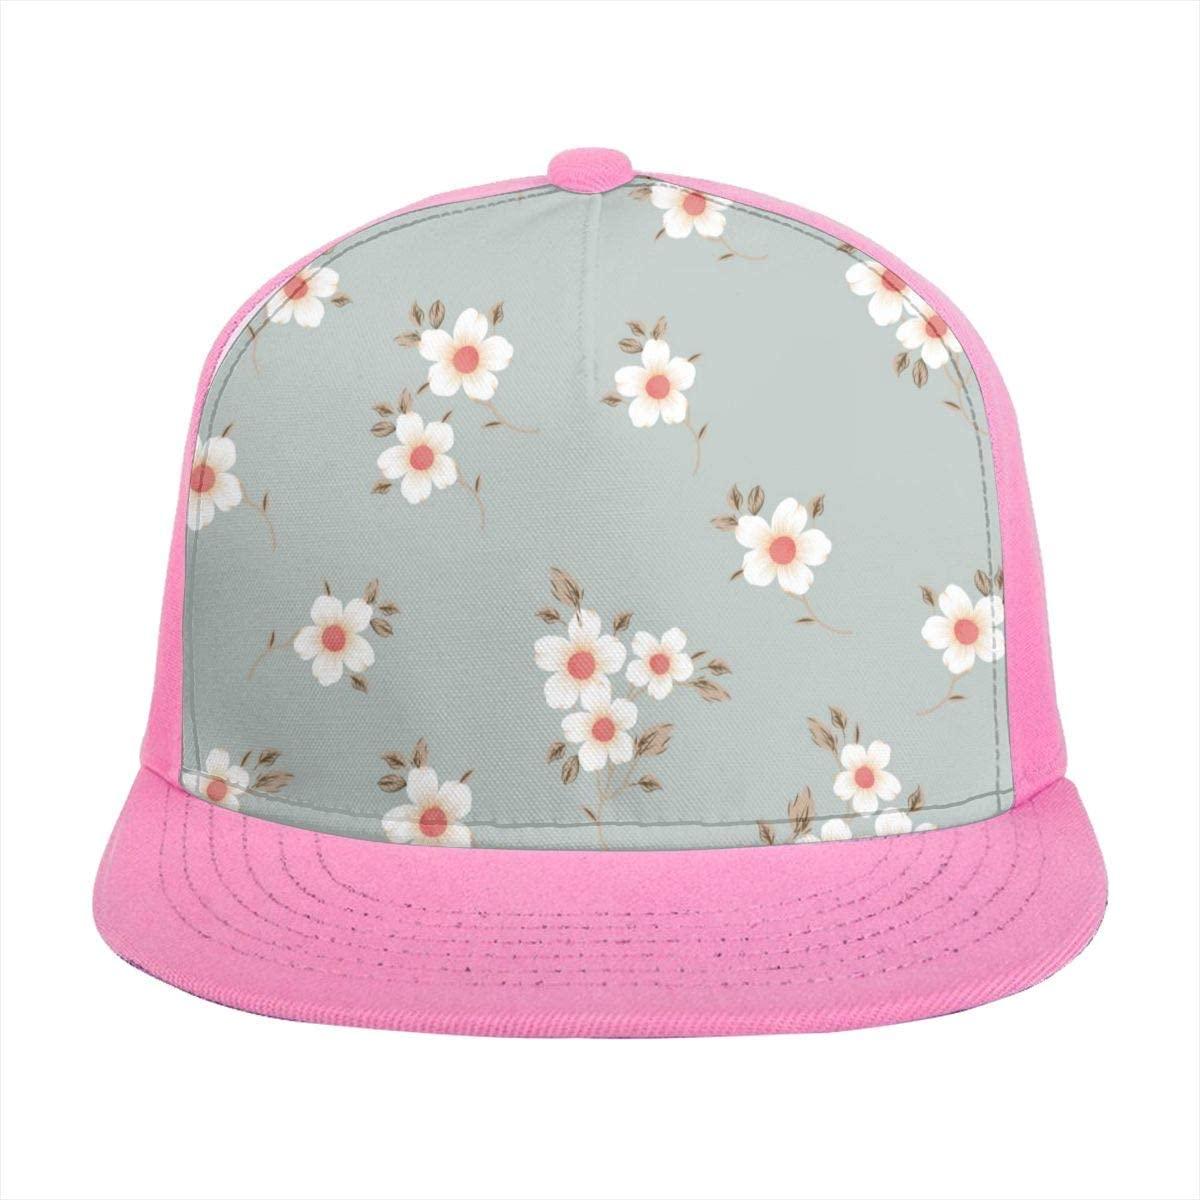 Sun Visor Hat Cute Pretty Flowers Chic Floral Baseball Cap Flat Brim Hat for Women Men Summer